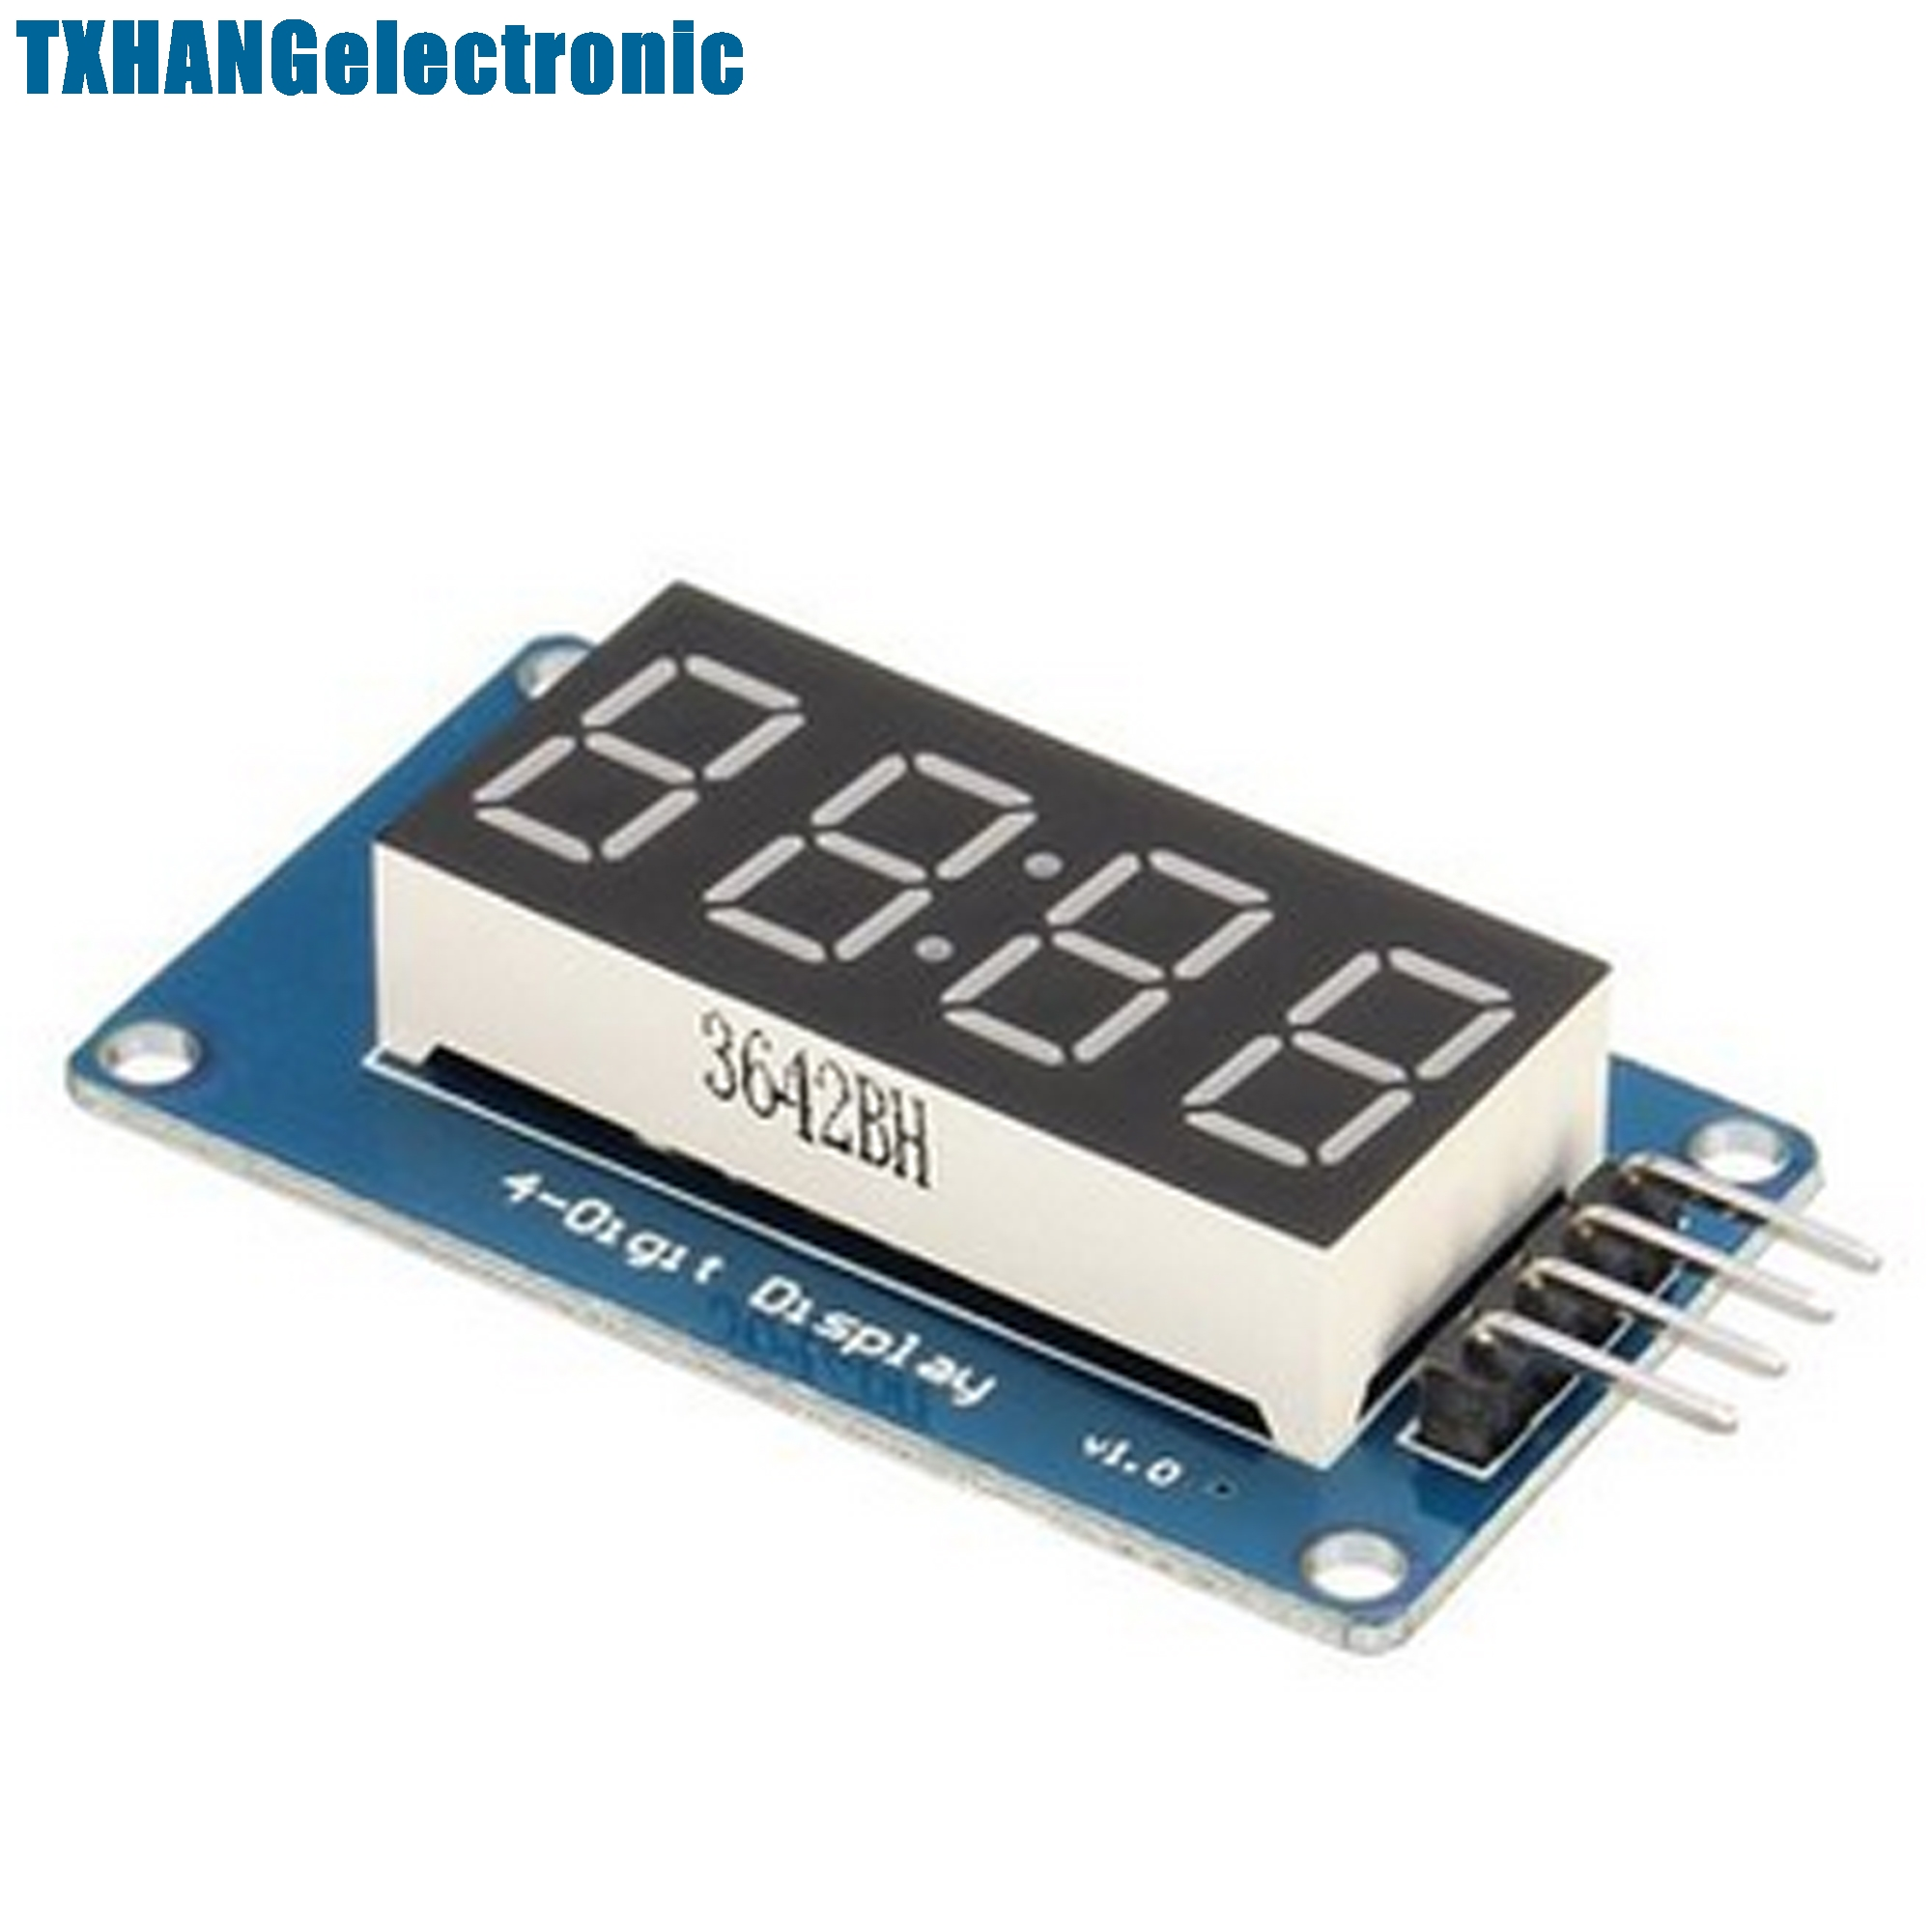 4 биты цифровой LED Дисплей модуль с часами Дисплей tm1637